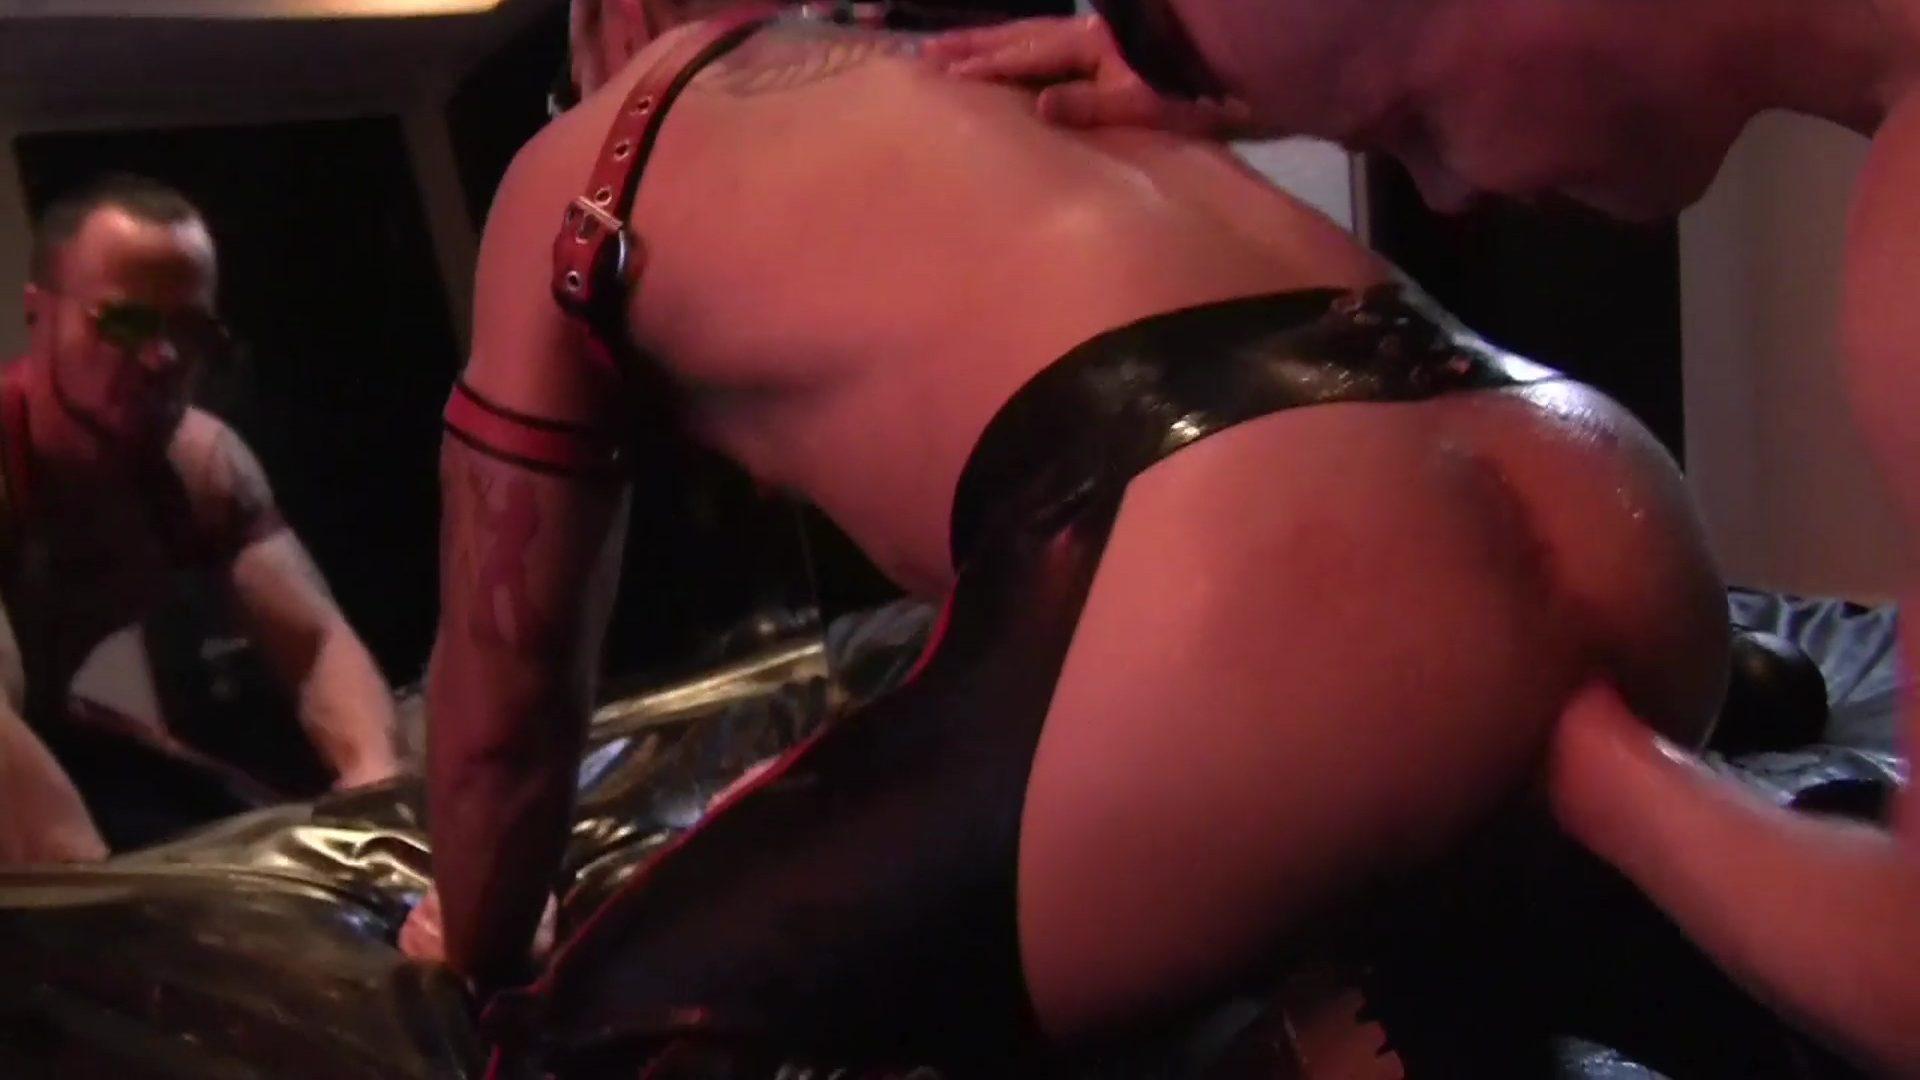 Ashley Fists Eddie - Part 2 1